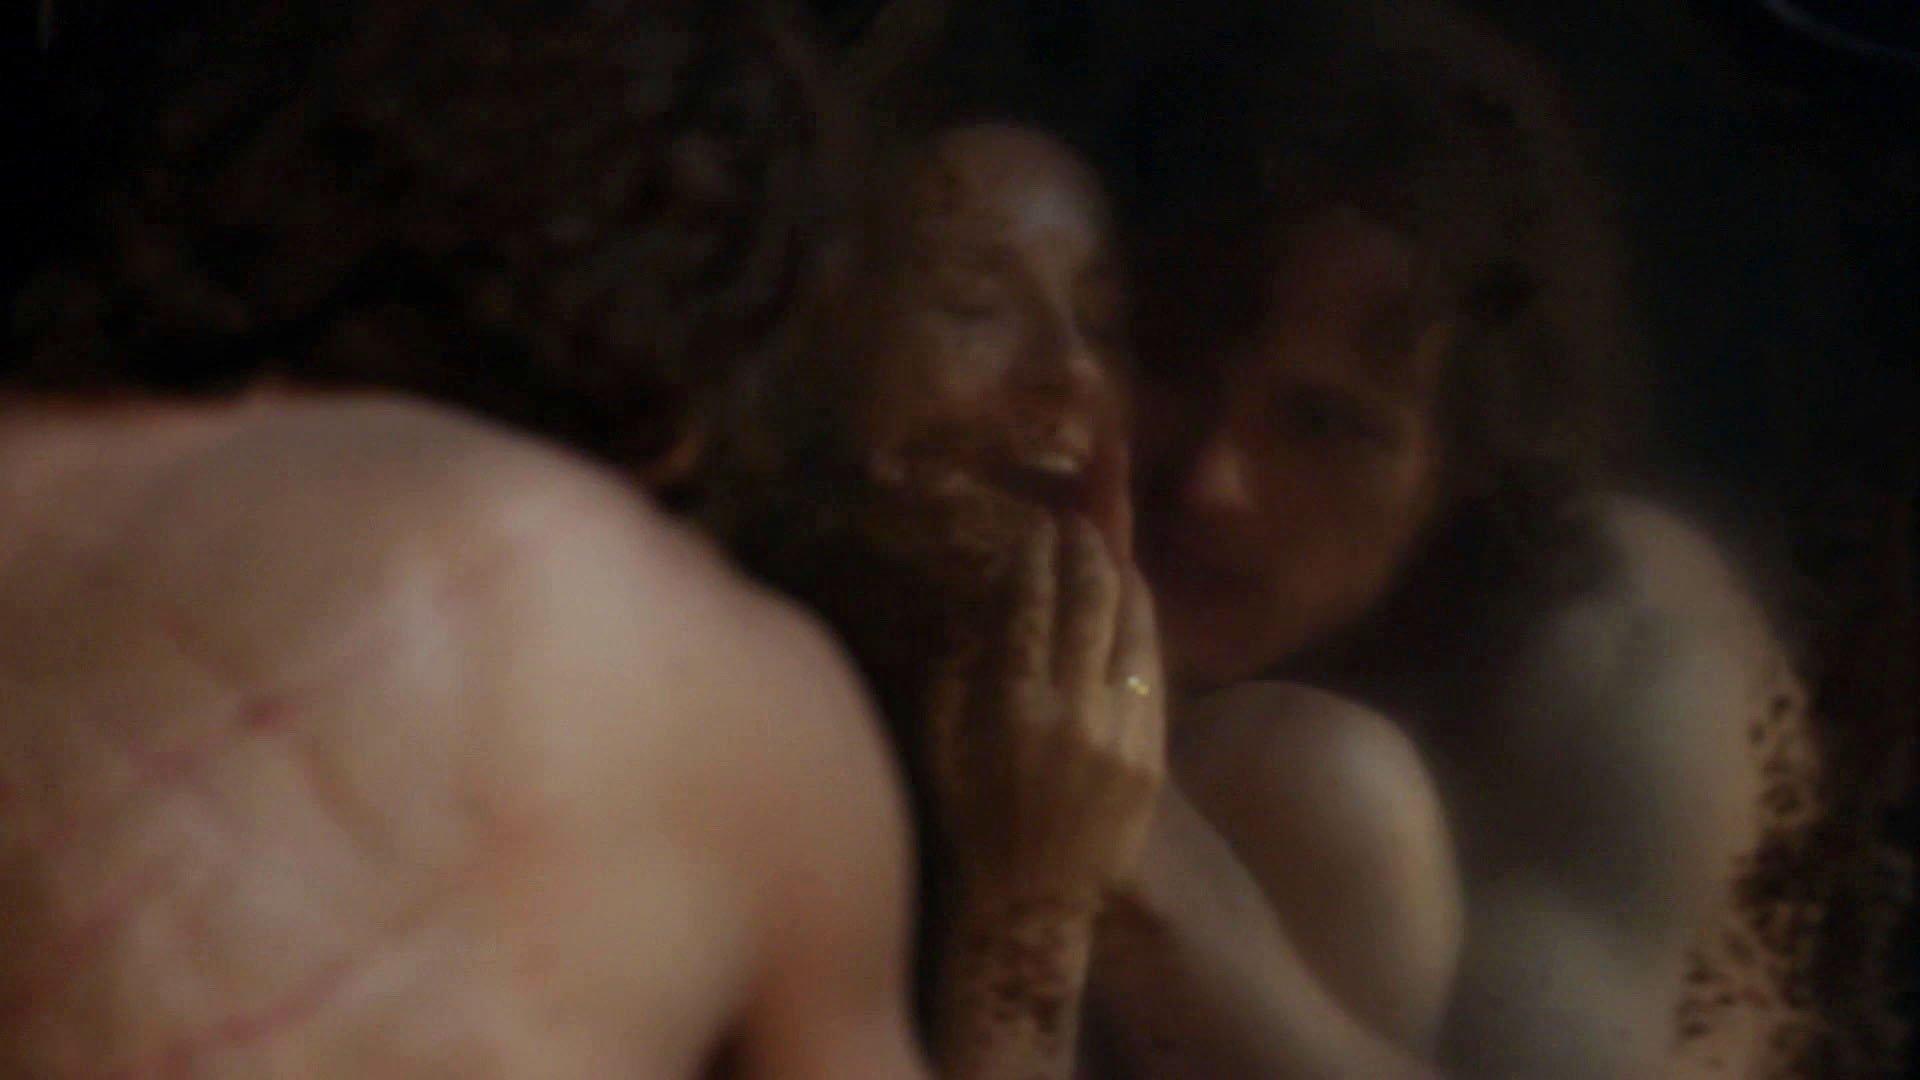 Caitriona balfe nude outlander s01e07 8